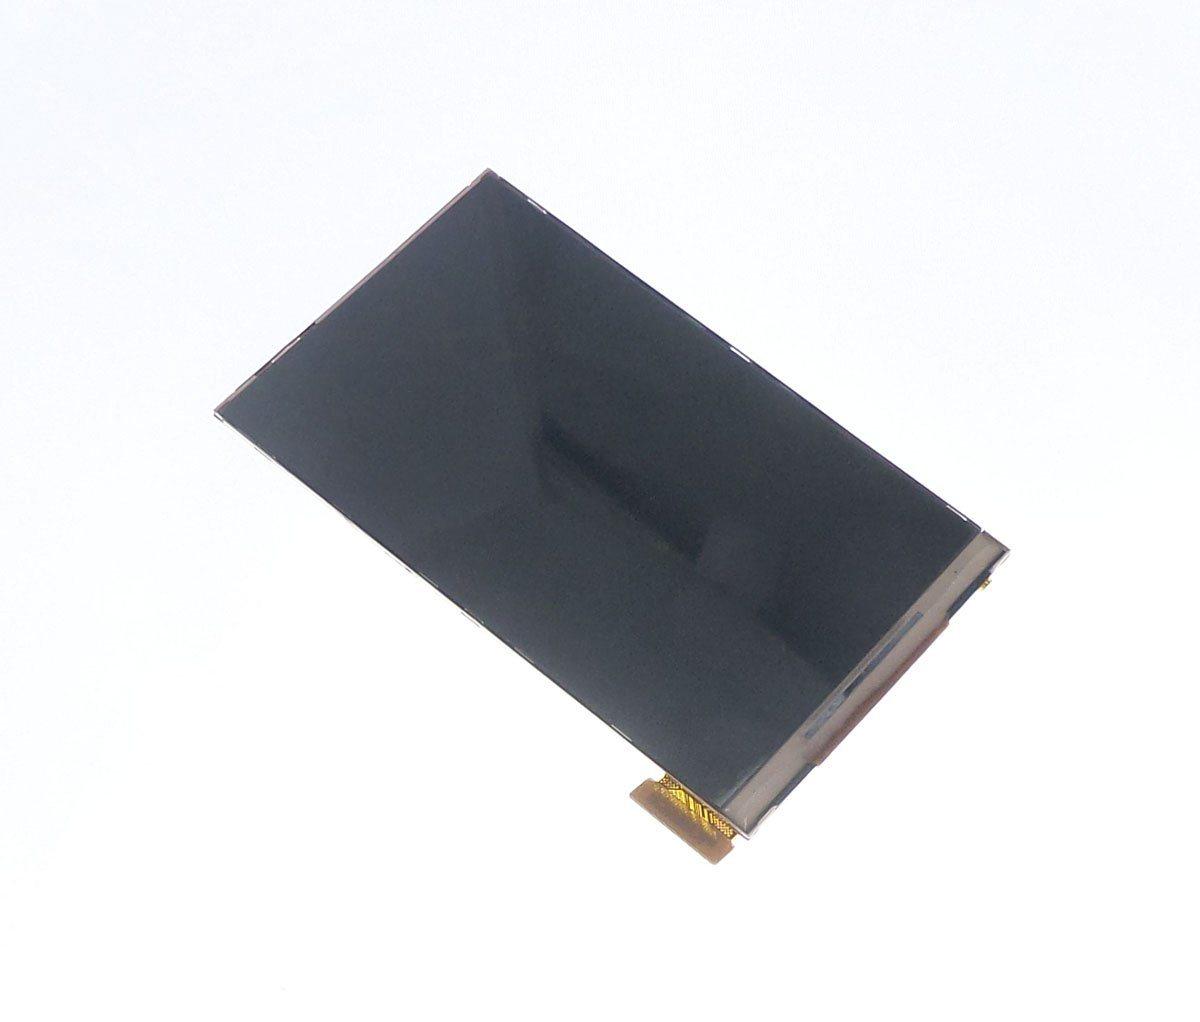 Ecran LCD pour Samsung Galaxy Trend 2 Lite G318h